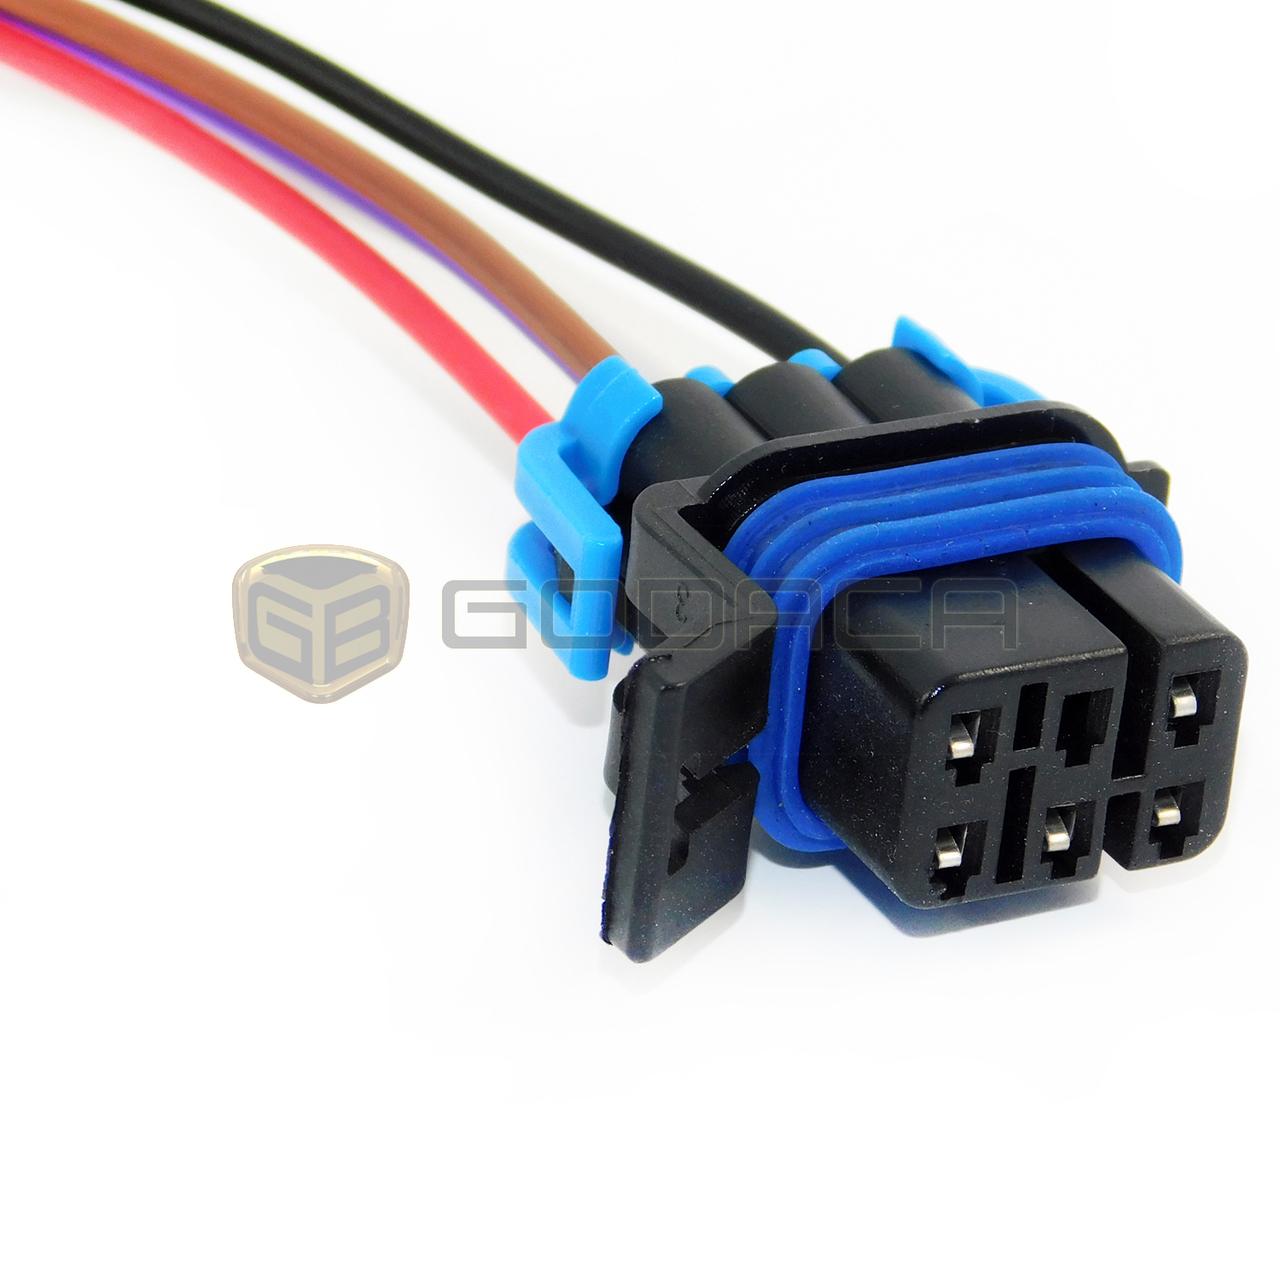 2006-2008 pontiac g5 cobalt fuel pump wiring harness 15293891 oem sudlabo.fr  sudlabo